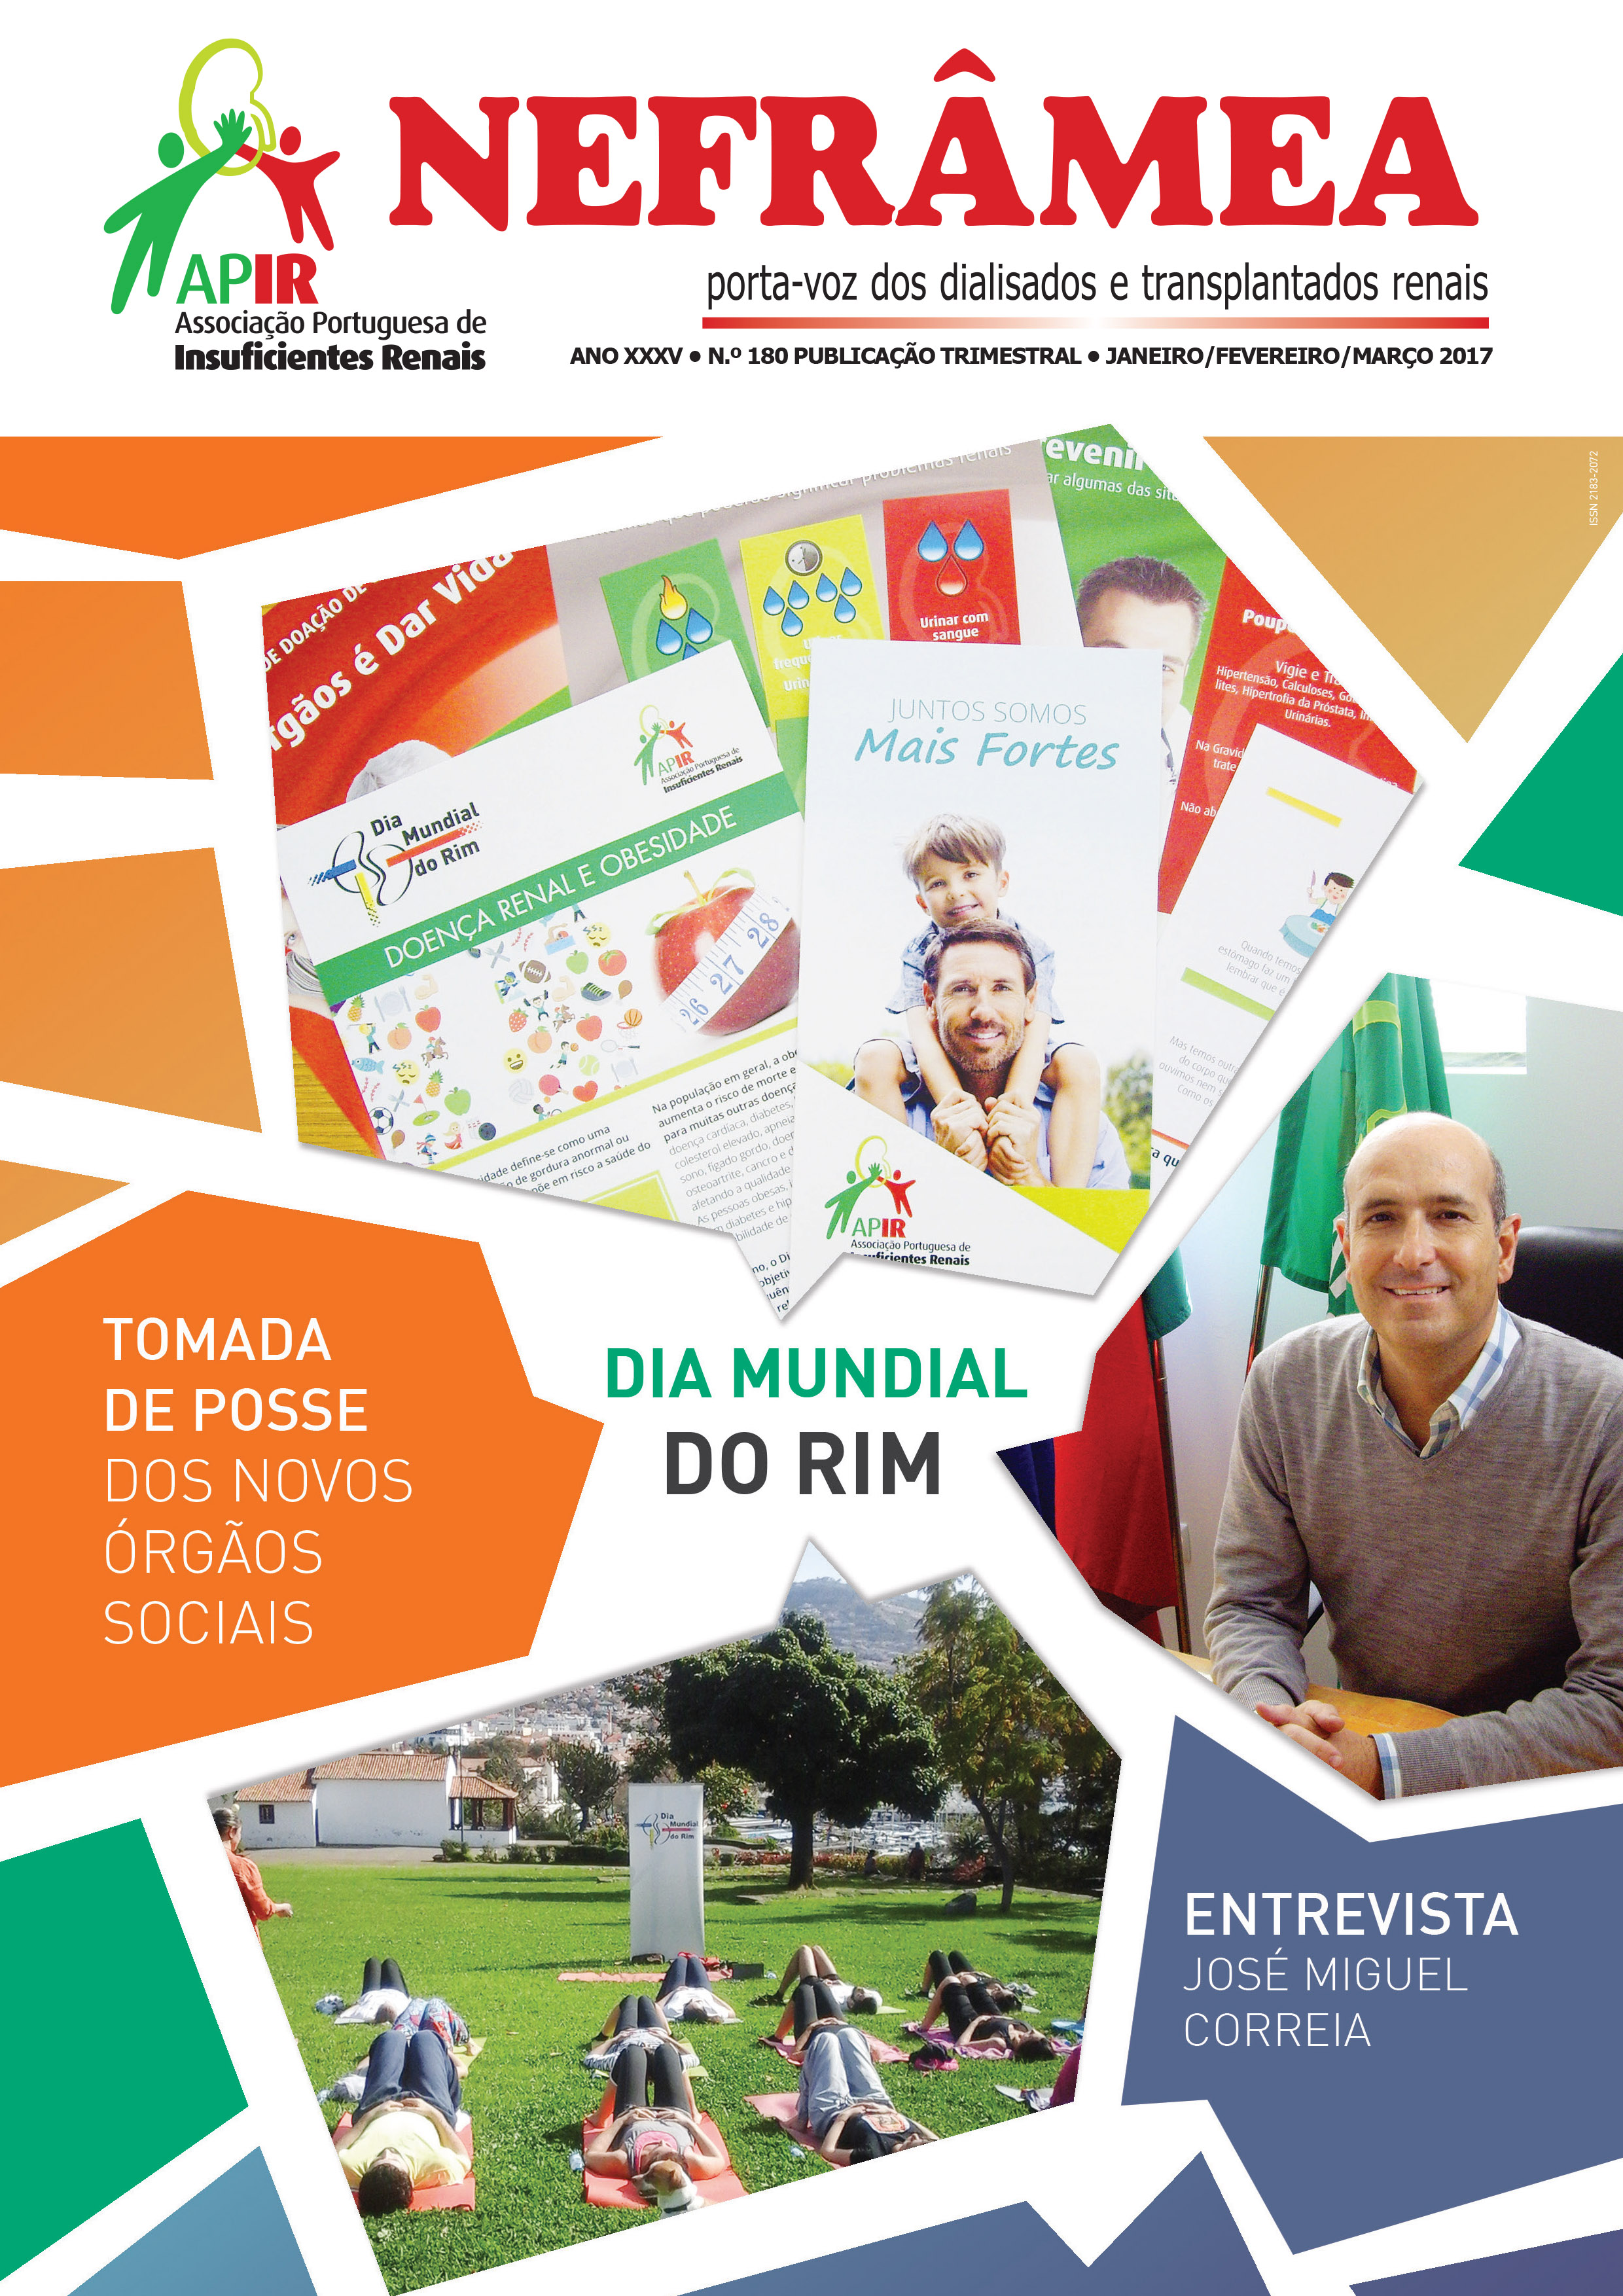 CAPA Revista Neframea 180